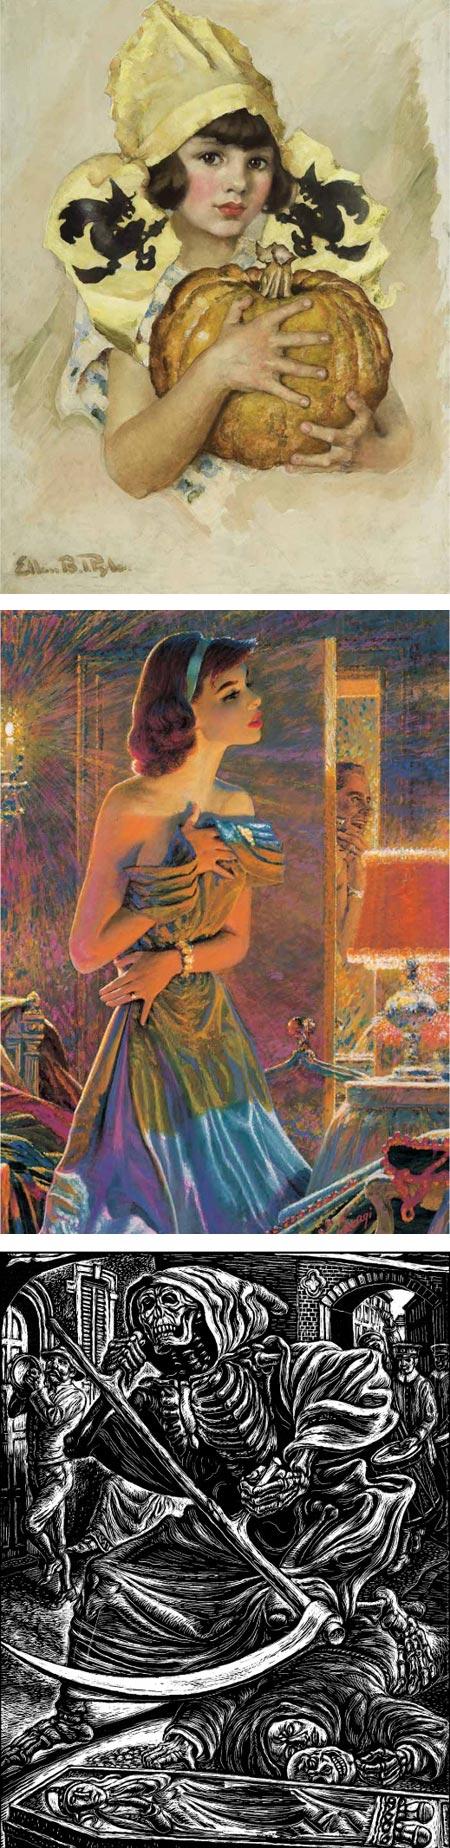 Illustration 30: Ellen B. T. Pyle, Edwin Georgi, Douglas Walters